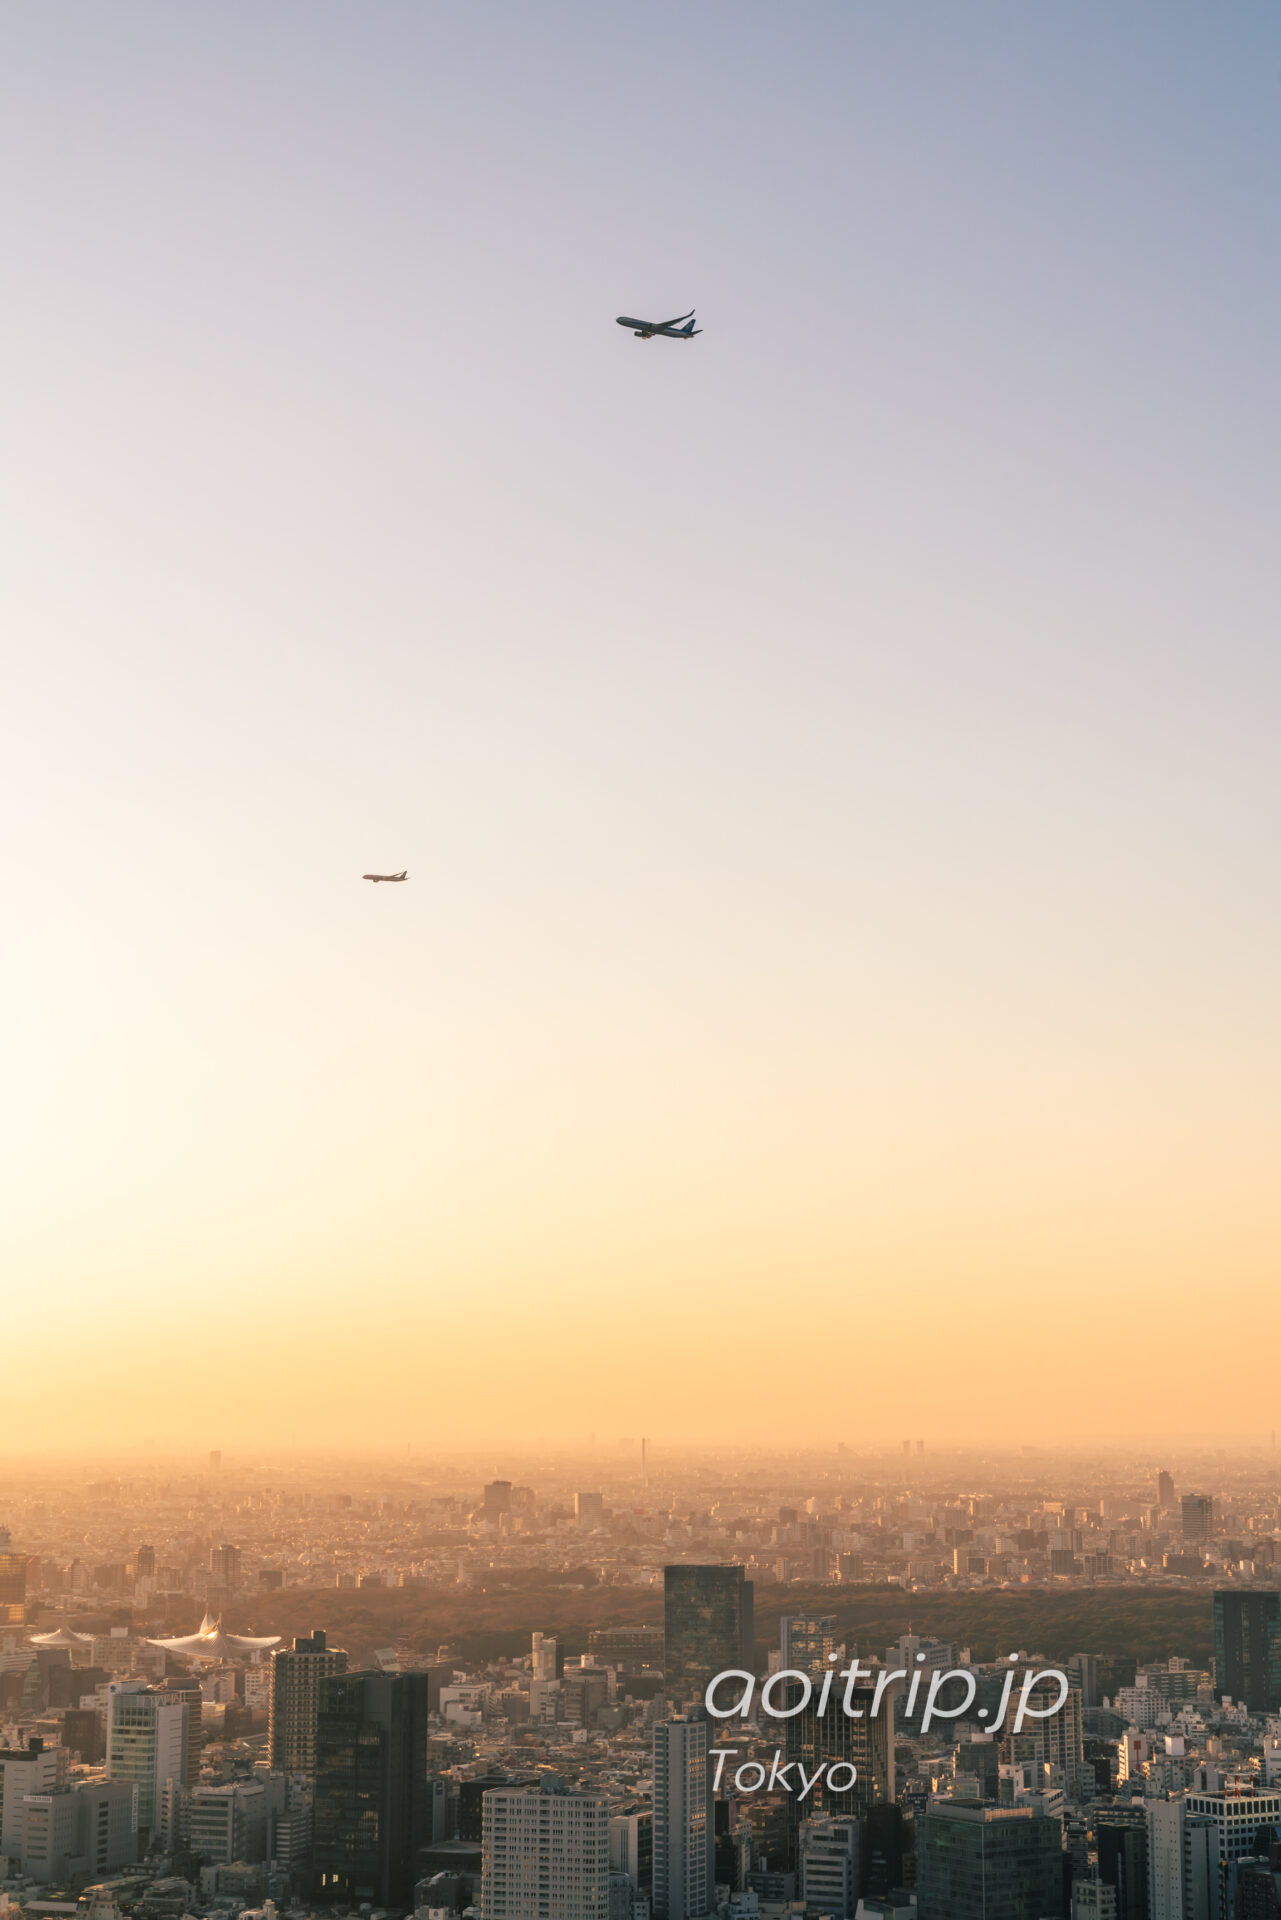 Tokyo Skyline ザ リッツカールトン東京から望む明治神宮と飛行機